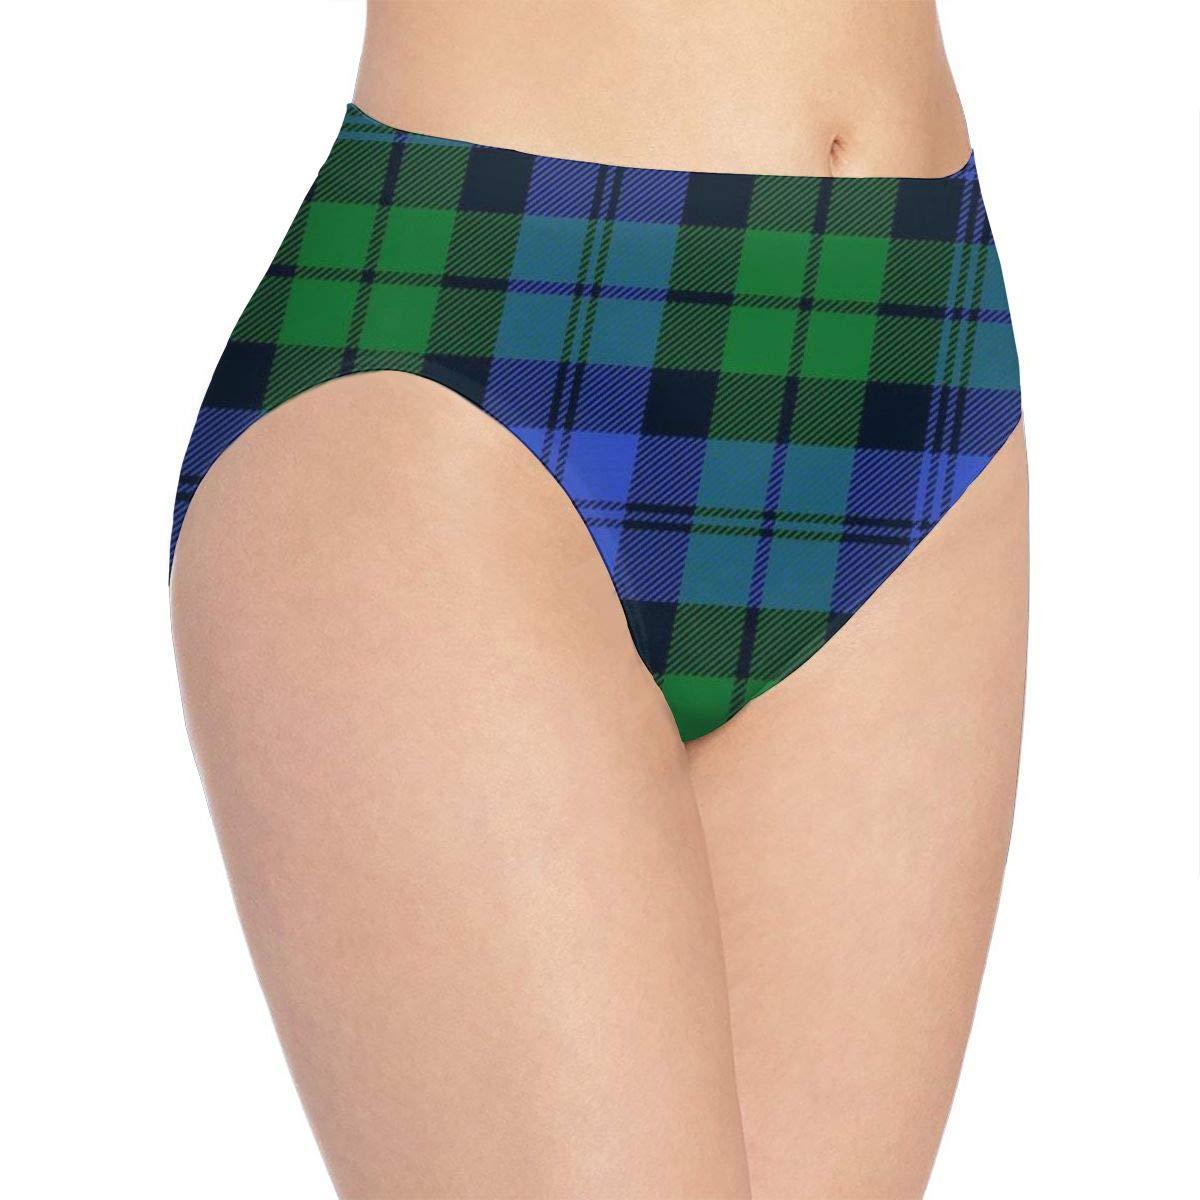 YIPOO Campbell Tartan 2 Womens Underwear Brief Panty Novelty Fun Crazy Supersoft Comfort Bikini